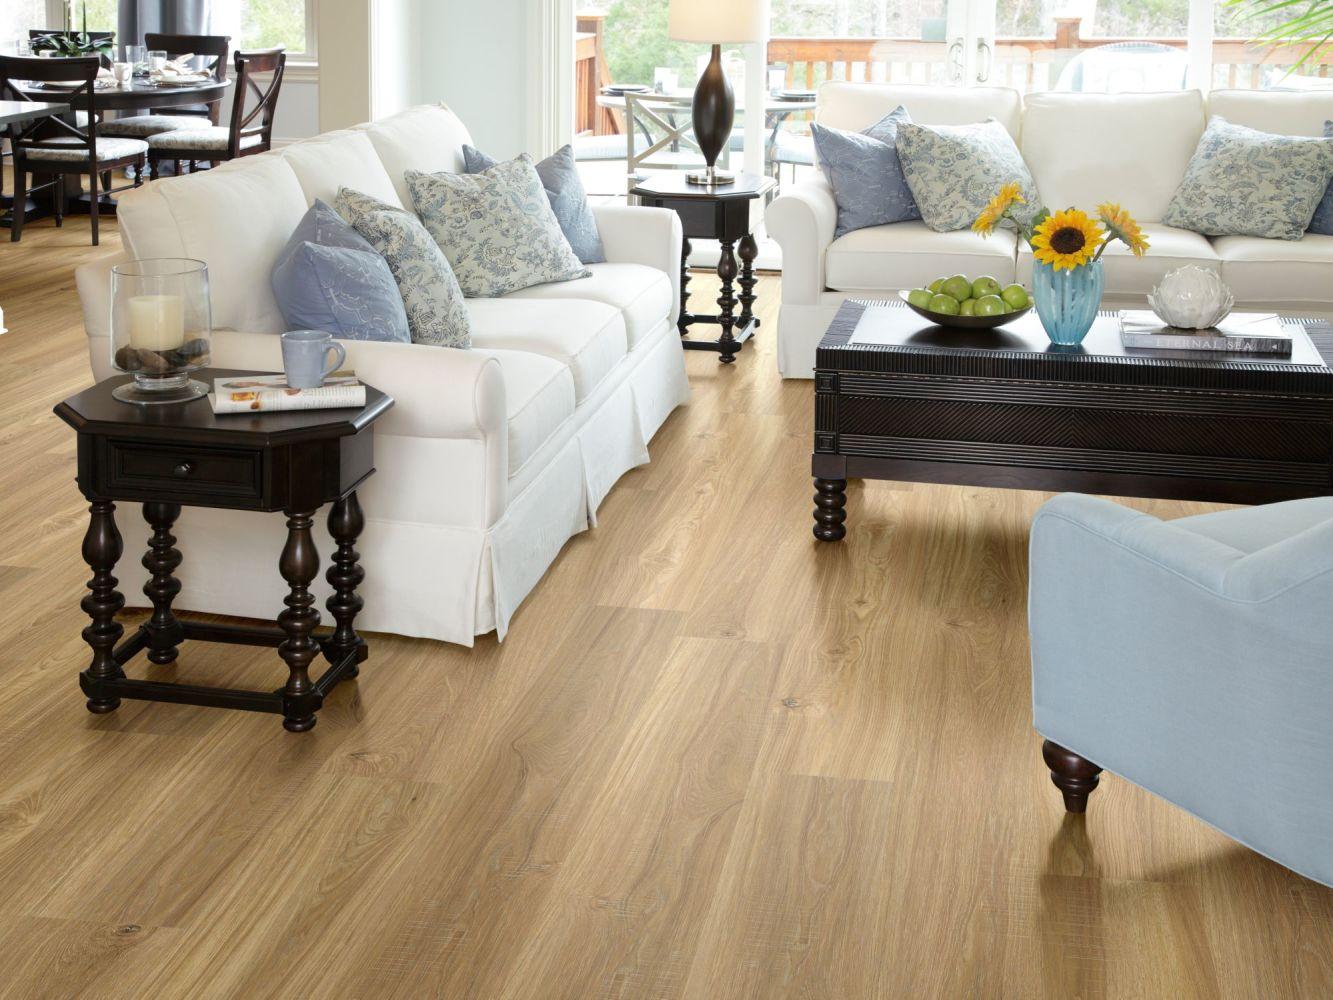 Shaw Floors Resilient Property Solutions Foundation Plank Mellow Oak 00109_VE180